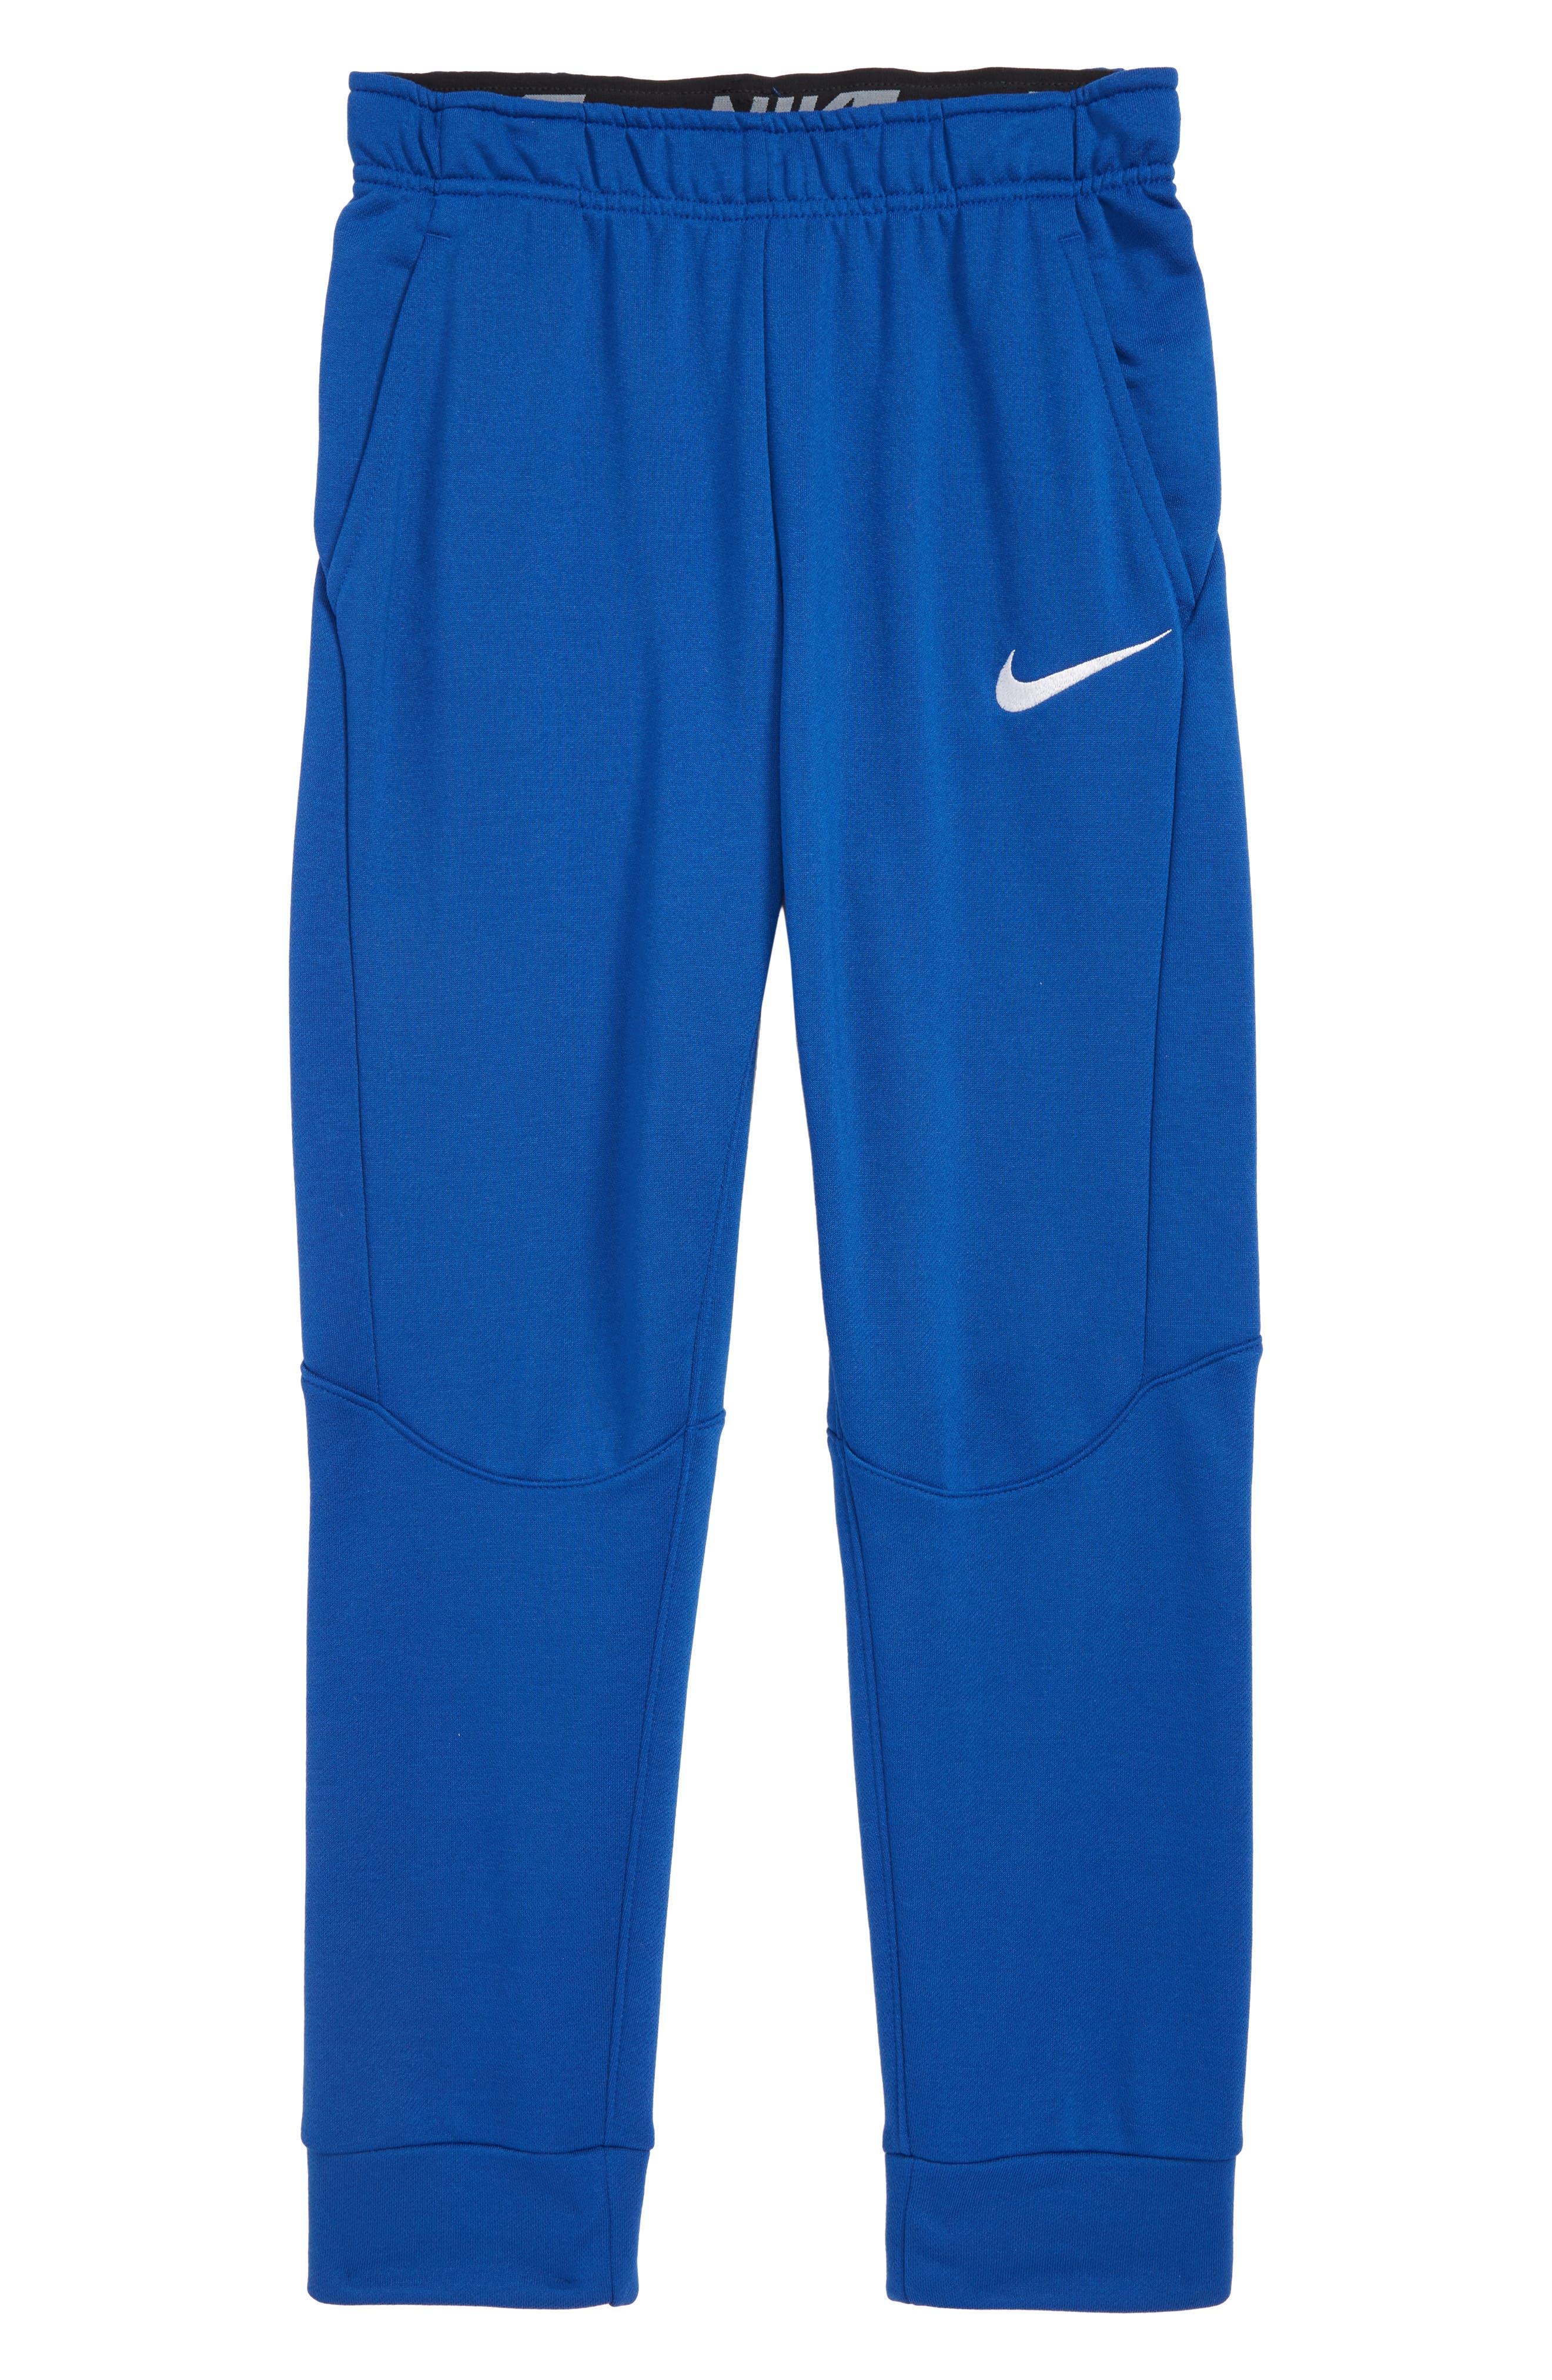 NIKE,                             Dry Fleece Training Pants,                             Main thumbnail 1, color,                             INDIGO FORCE/ WHITE